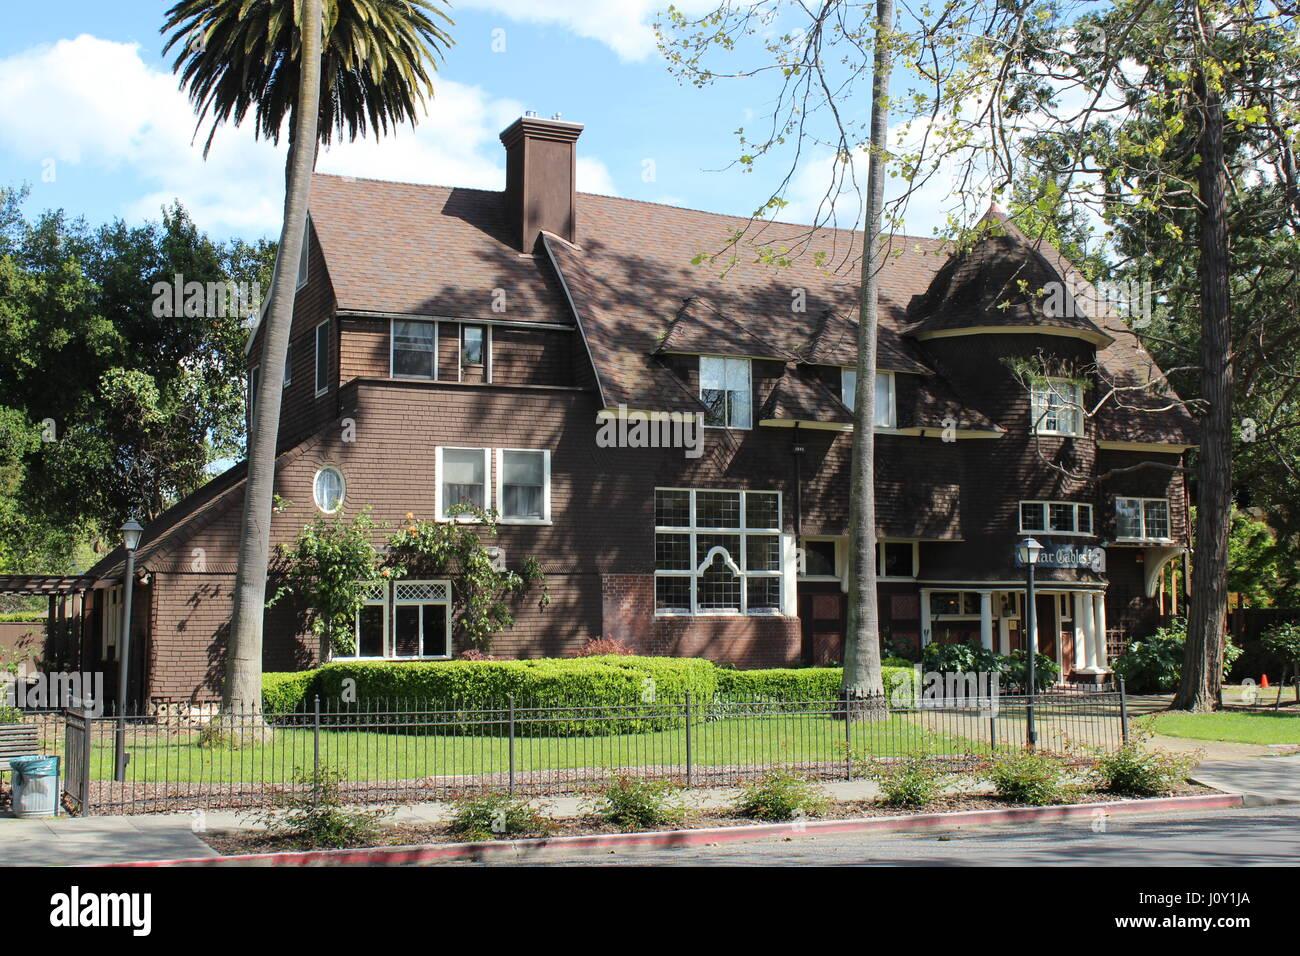 Cedar Gables Inn, Shingle-style House built in 1892 in Napa, California - Stock Image